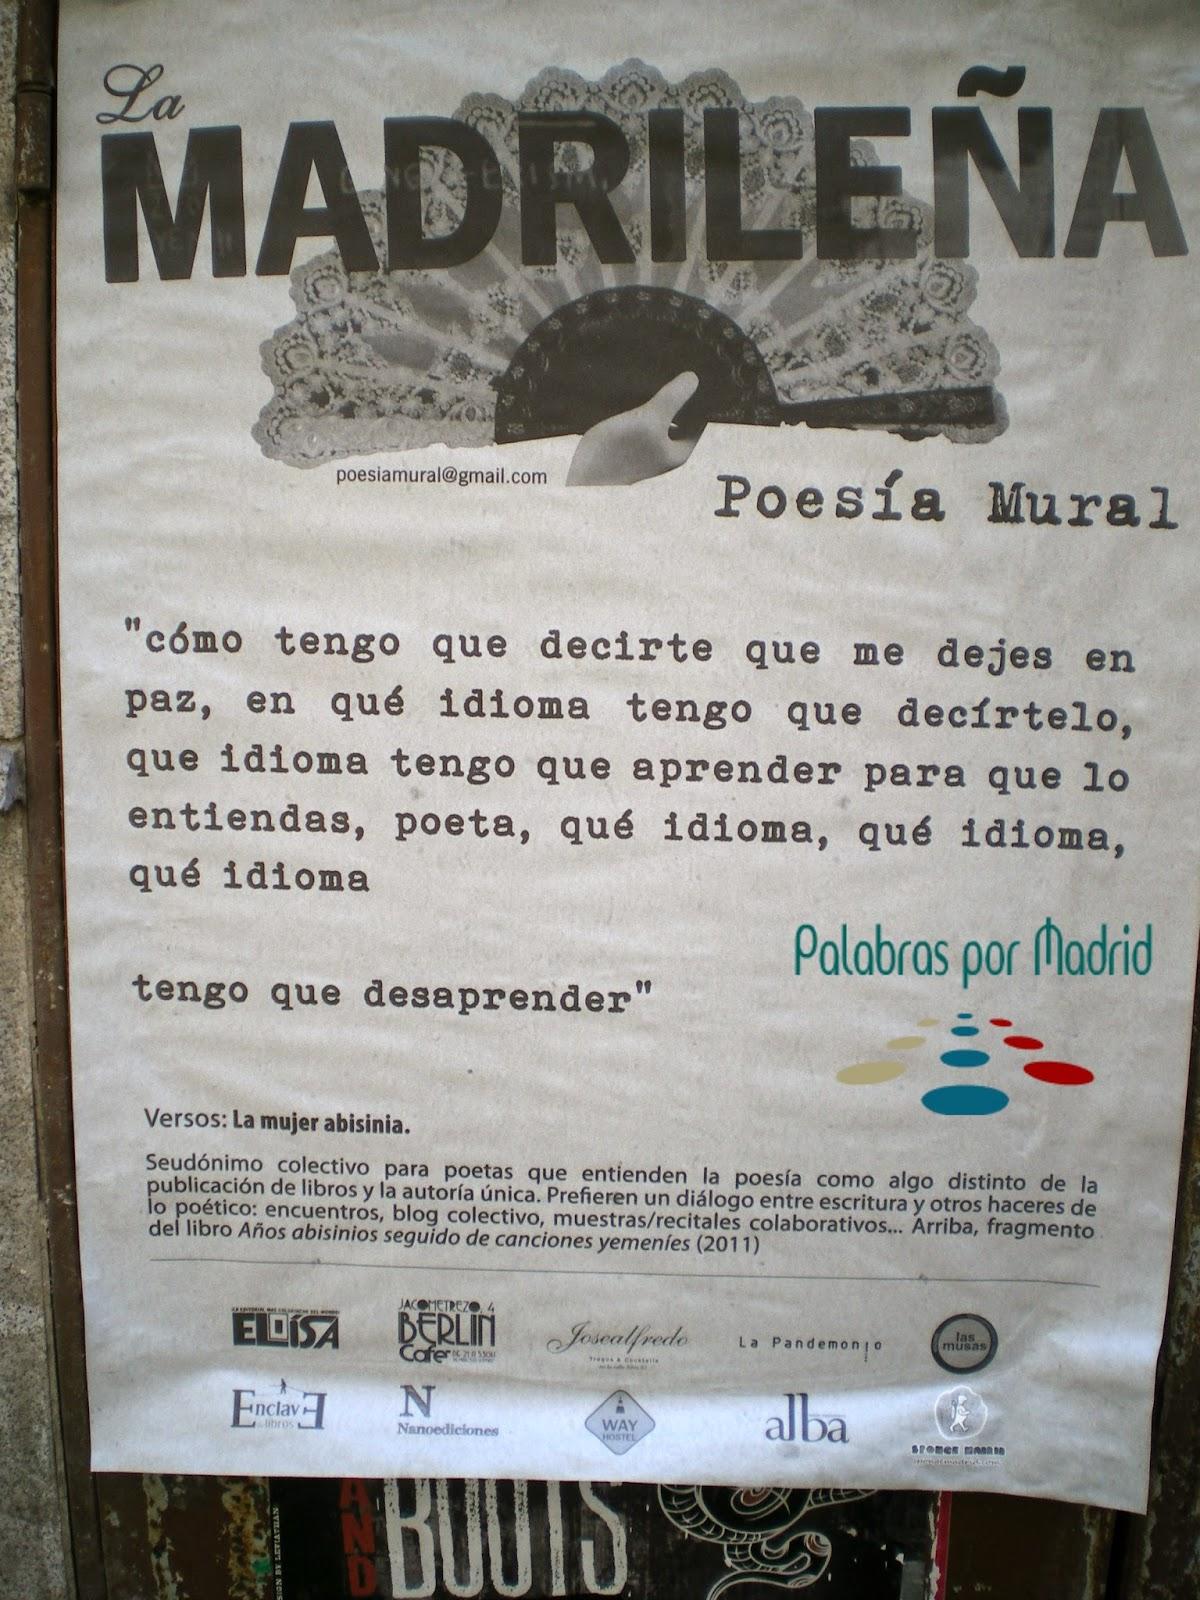 la madrilena poesia mural